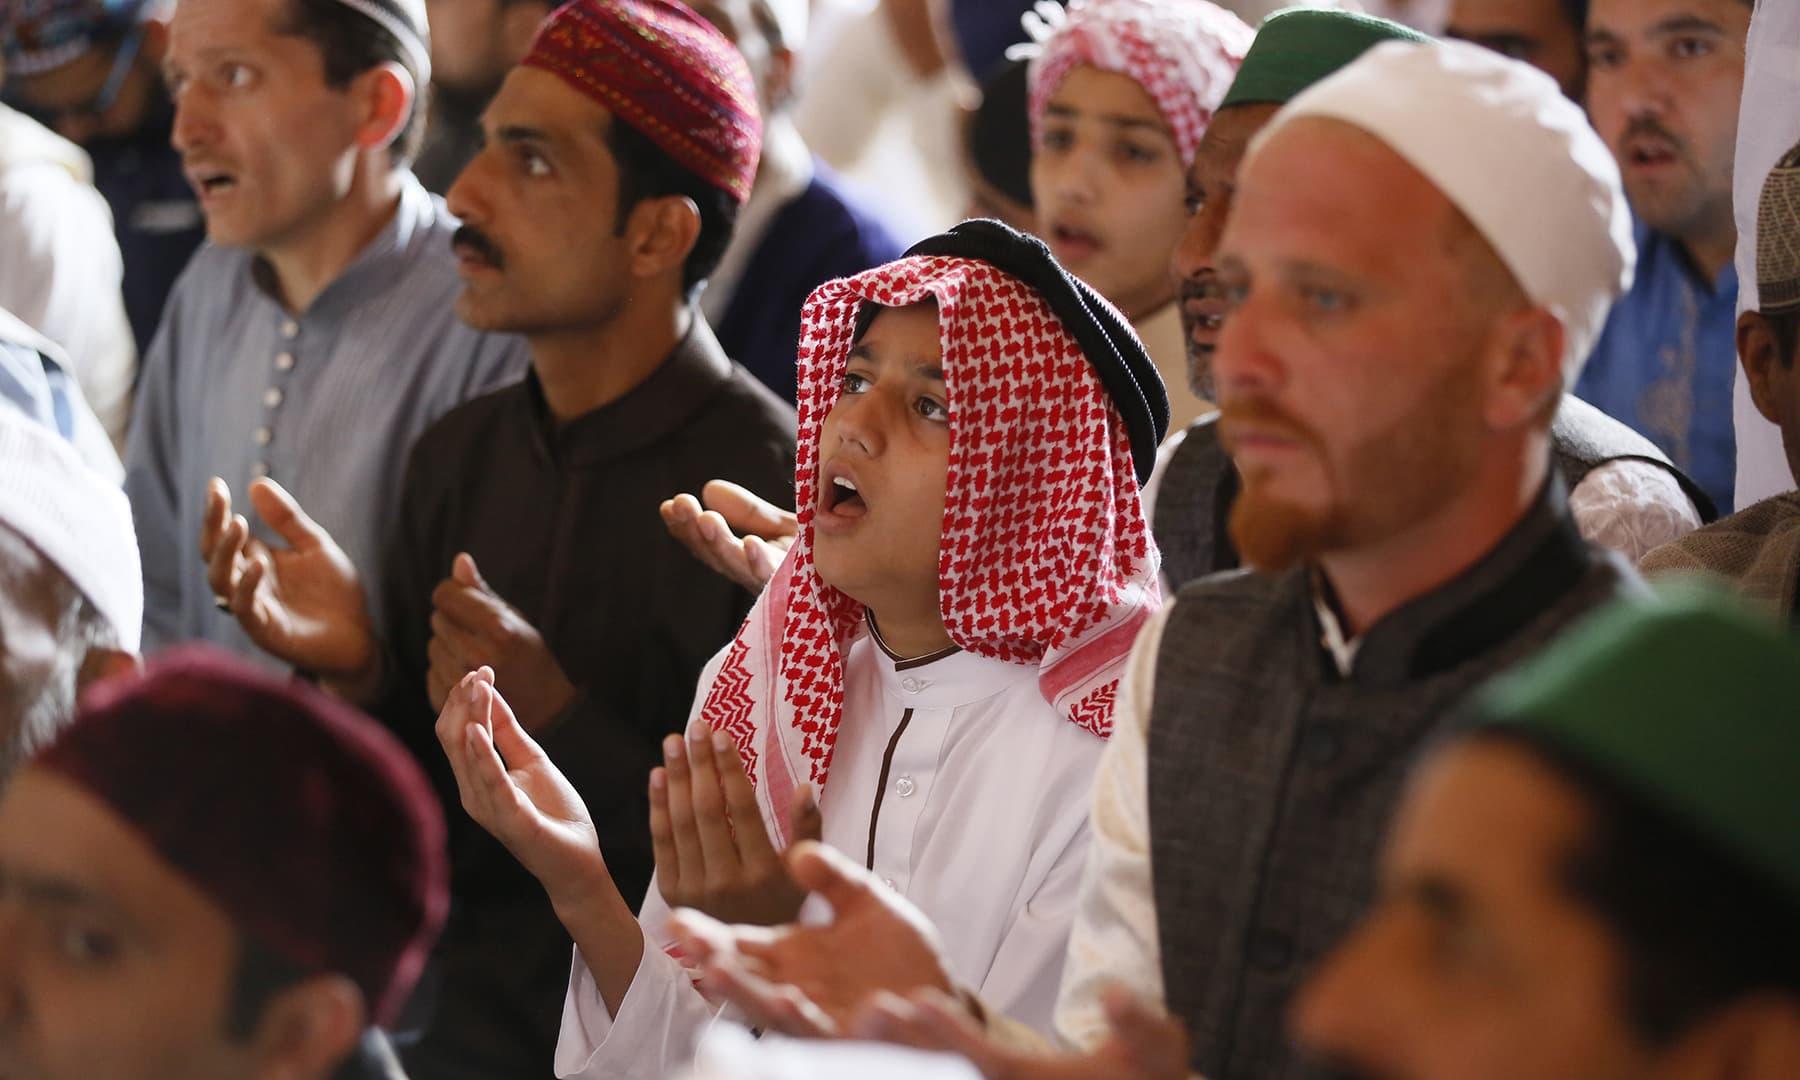 Muslims offer prayers during Eidul Fitr in Srinagar in Indian-occupied Kashmir on Wednesday, June 5. — AP